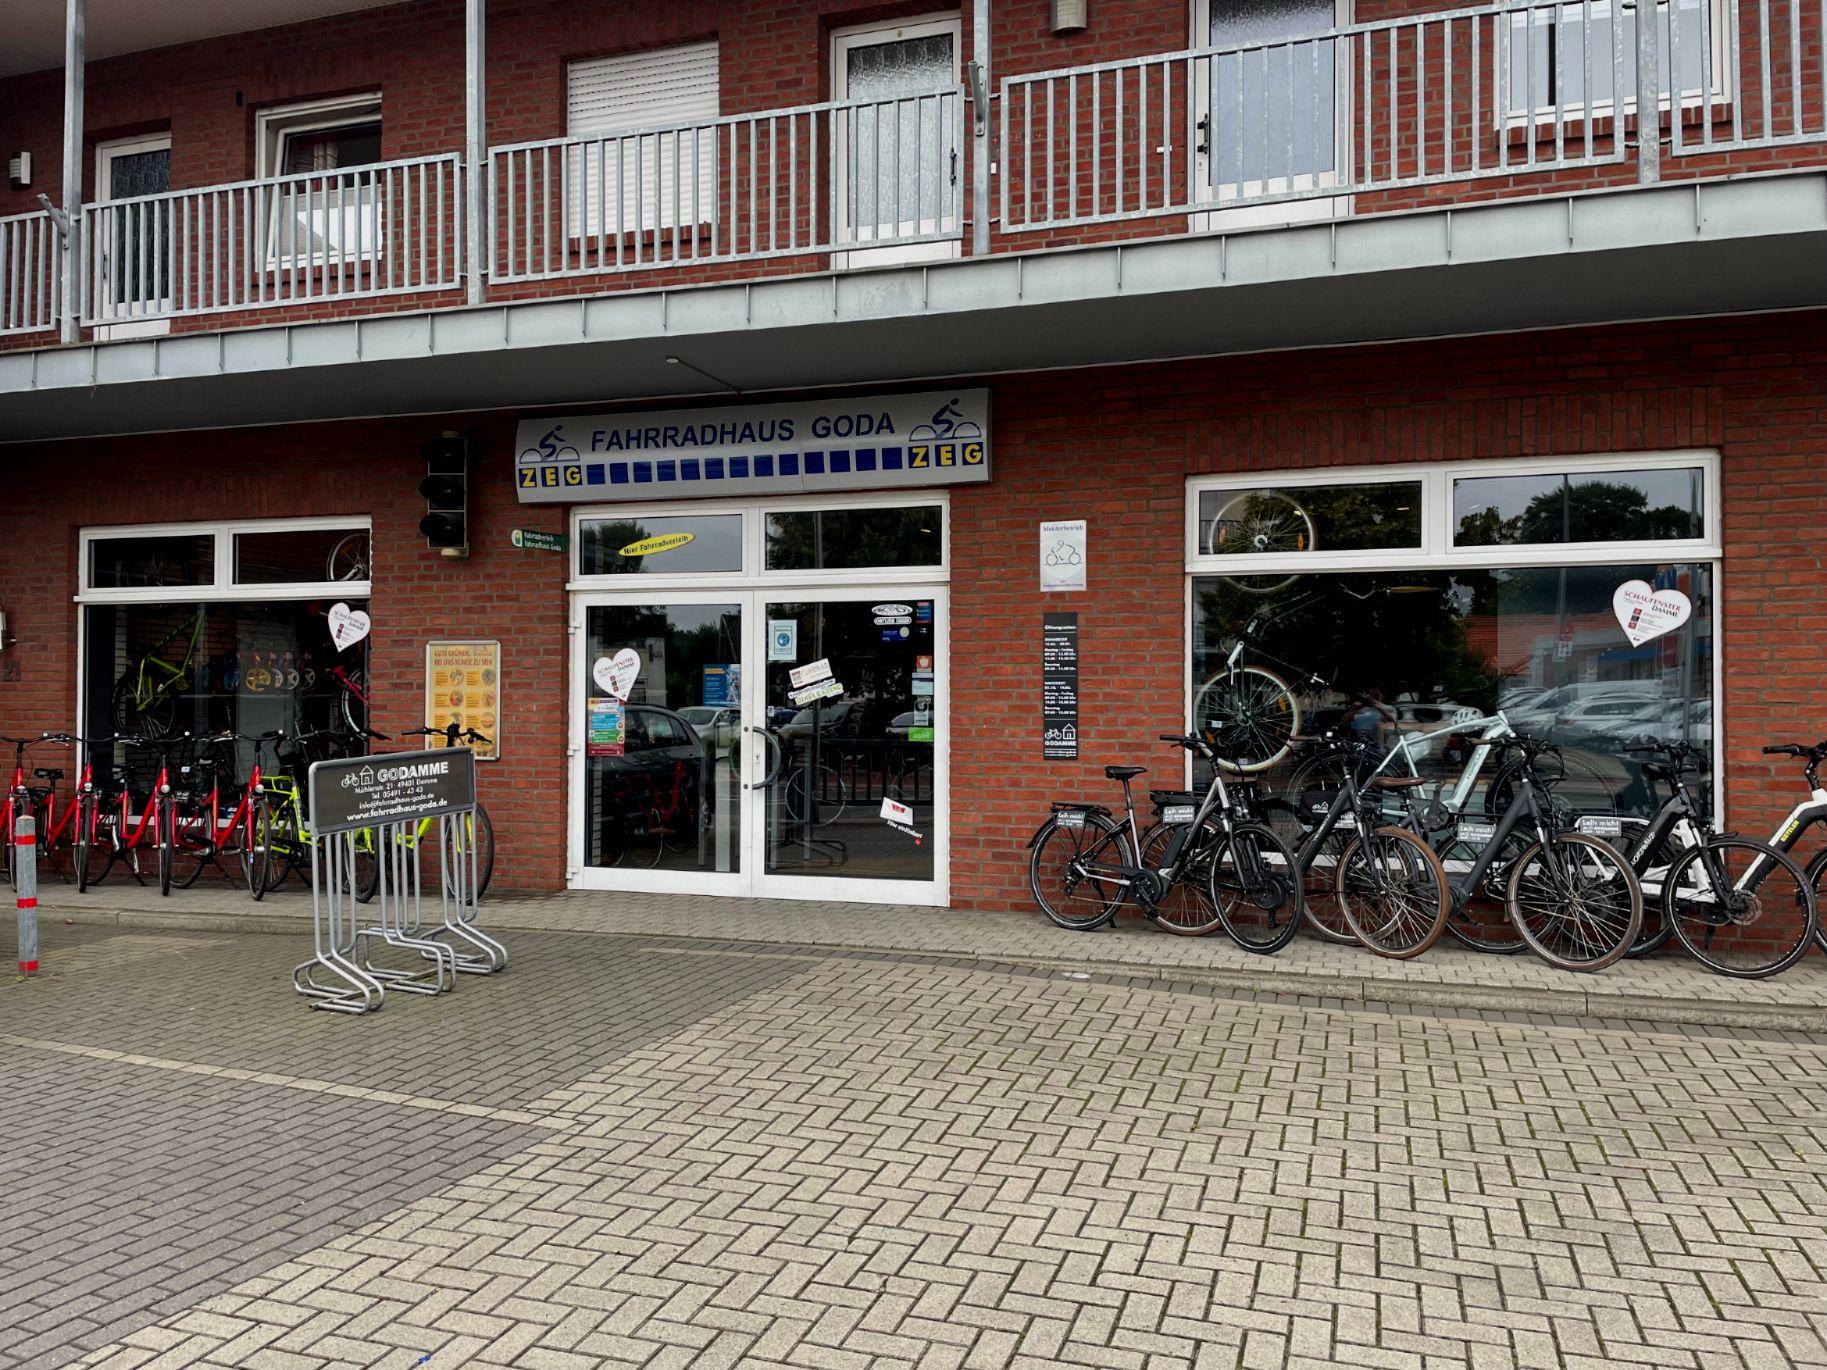 Fahrradhaus Goda